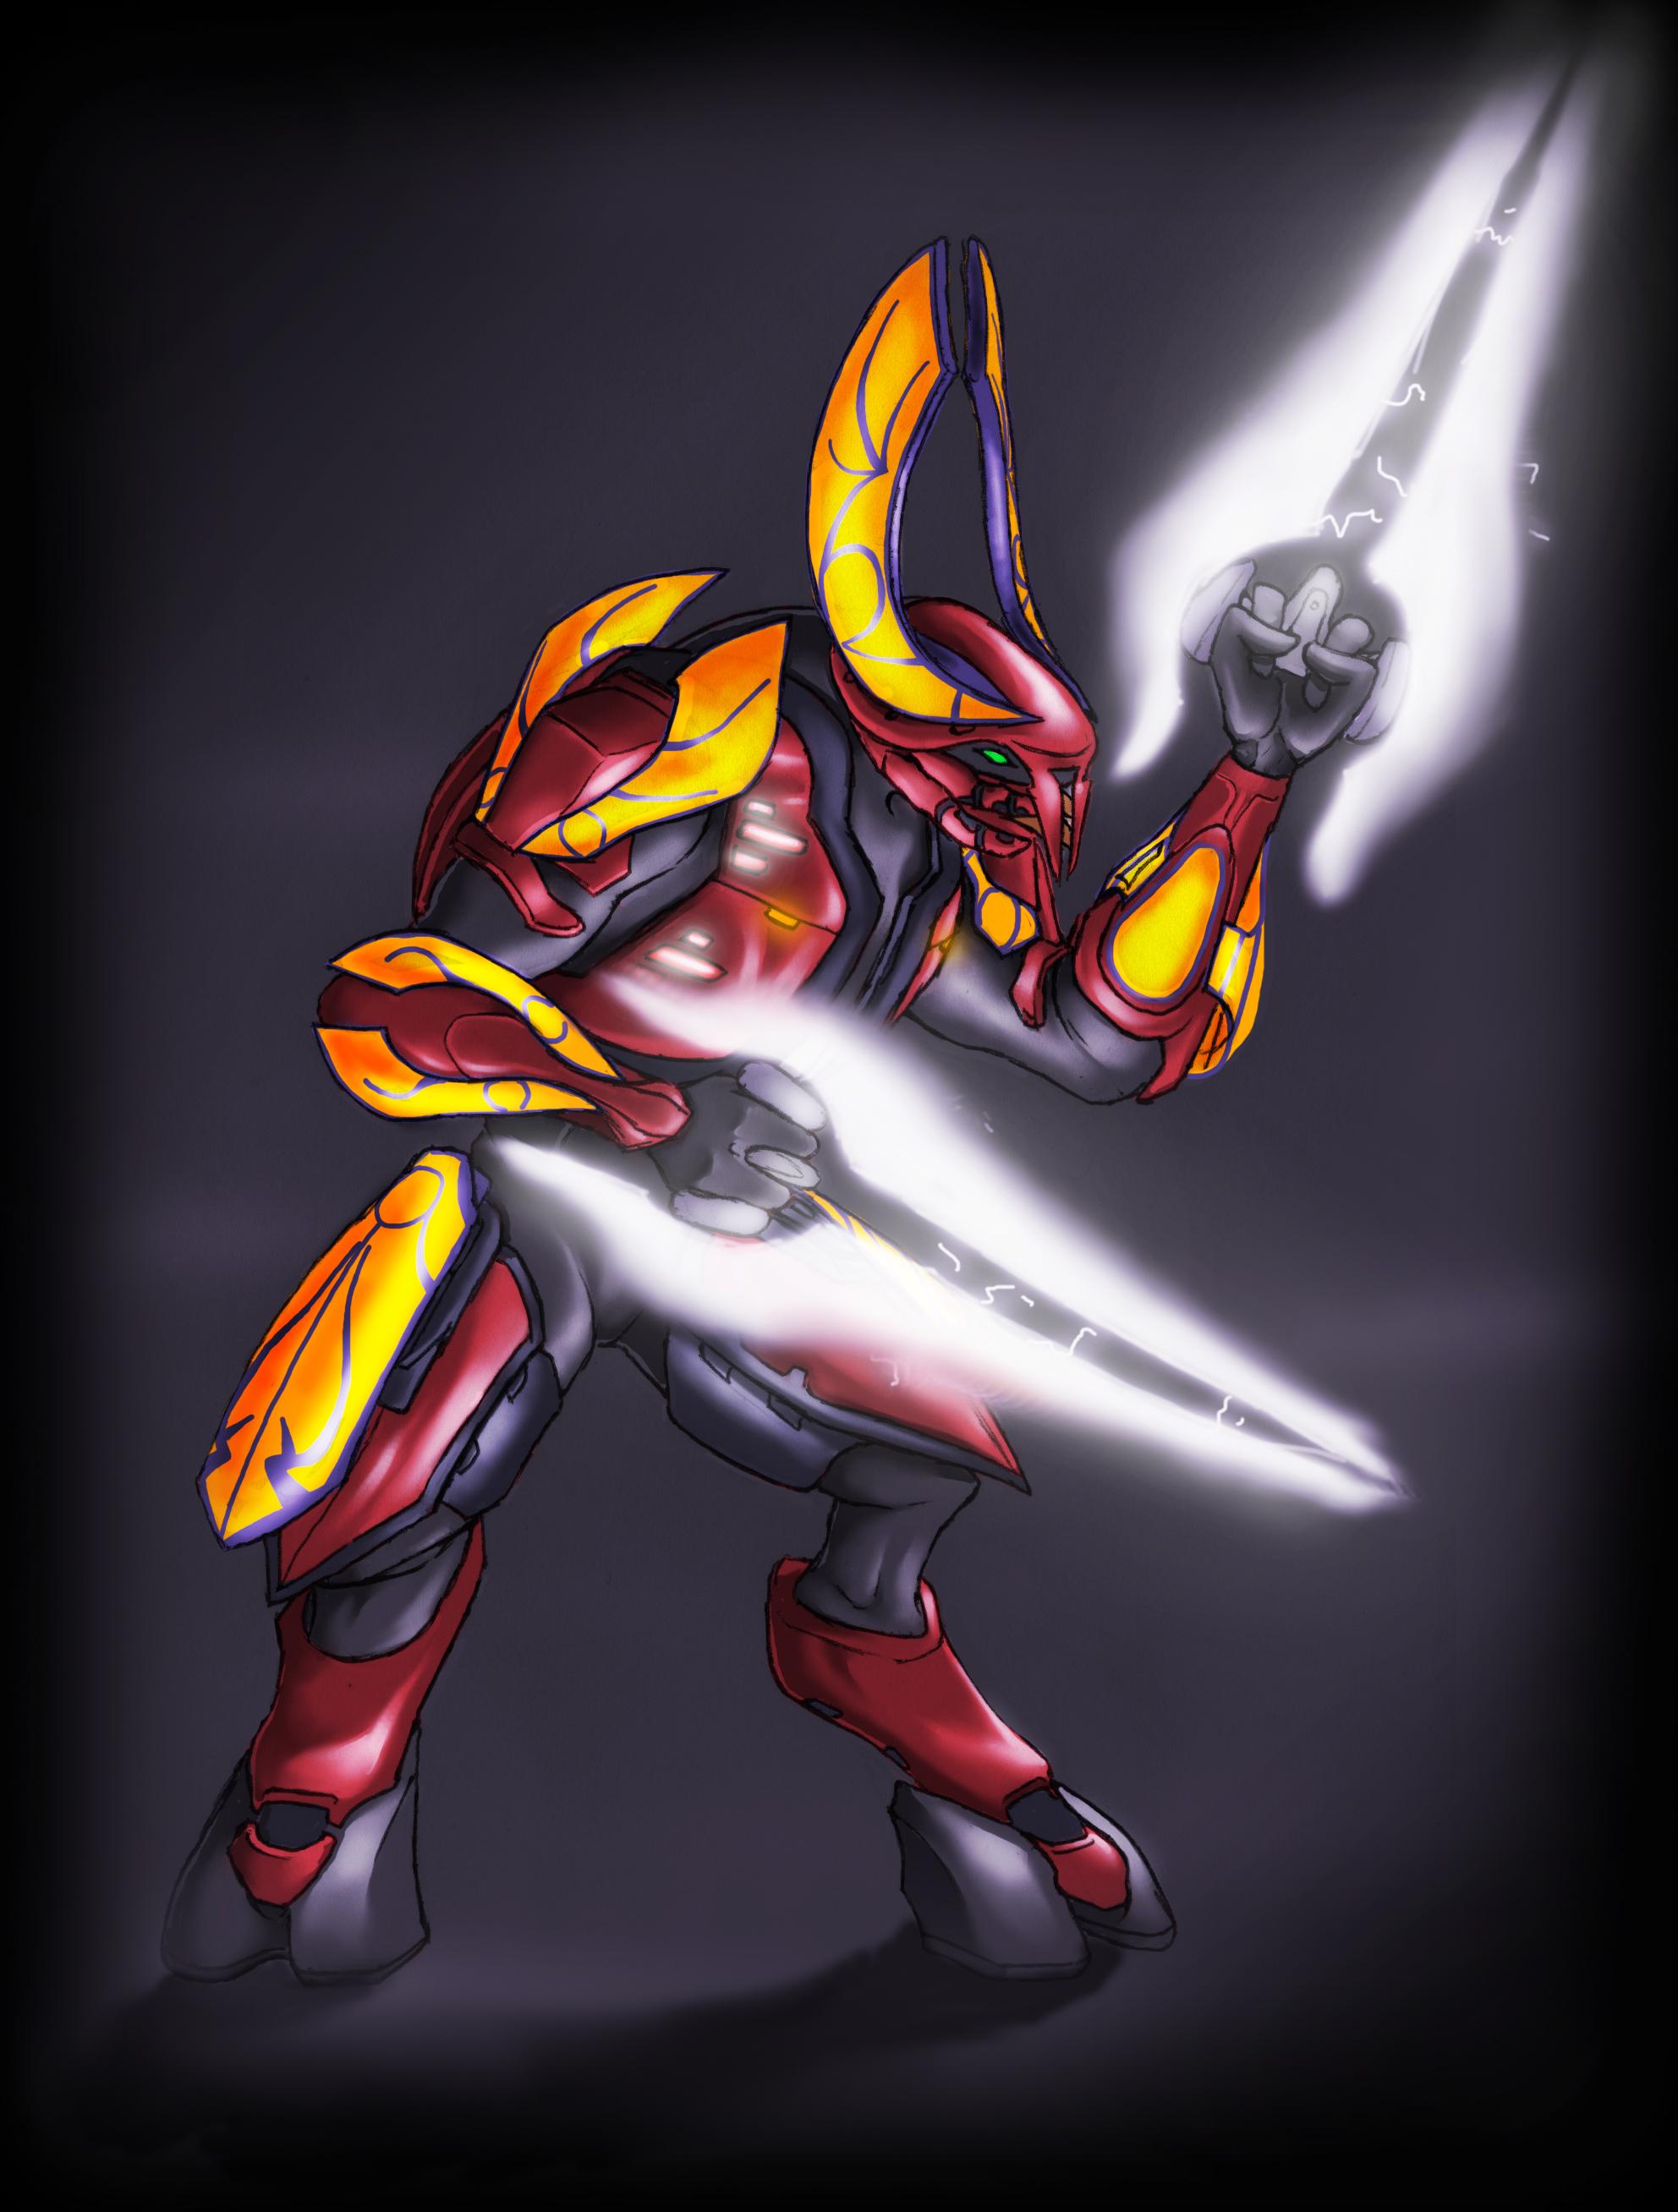 Halo 2 Honor Guard Elite by DemonicCriminal on DeviantArt